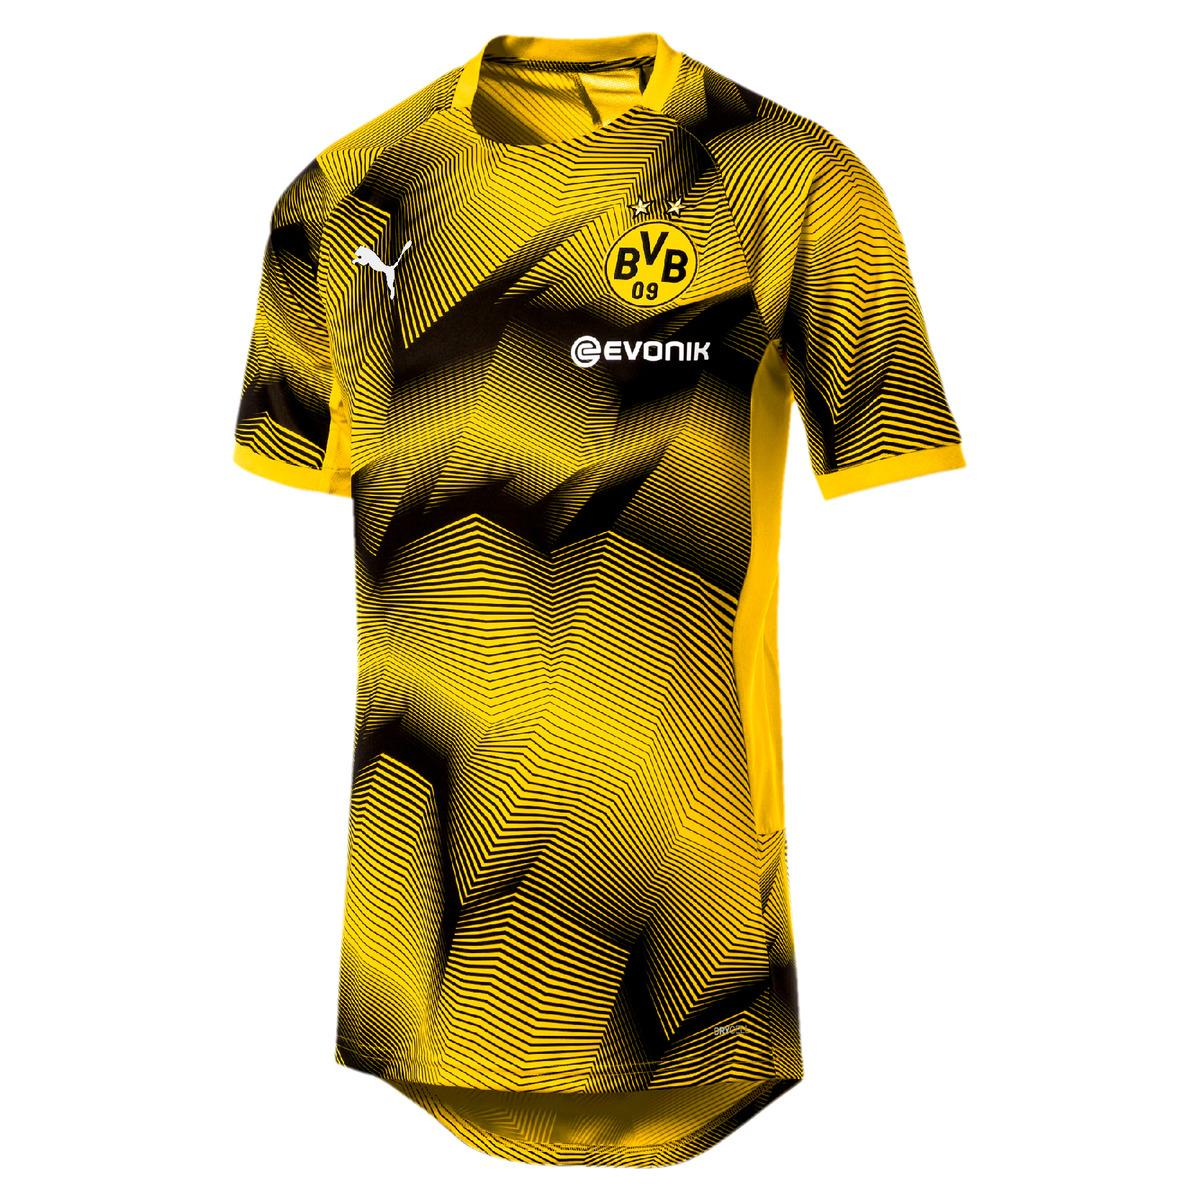 490ea1e7200 PUMA. Men's Yellow Borussia Dortmund Bvb 2018-2019 Stadium Graphic T-shirt.  £47 From El Corte Ingles